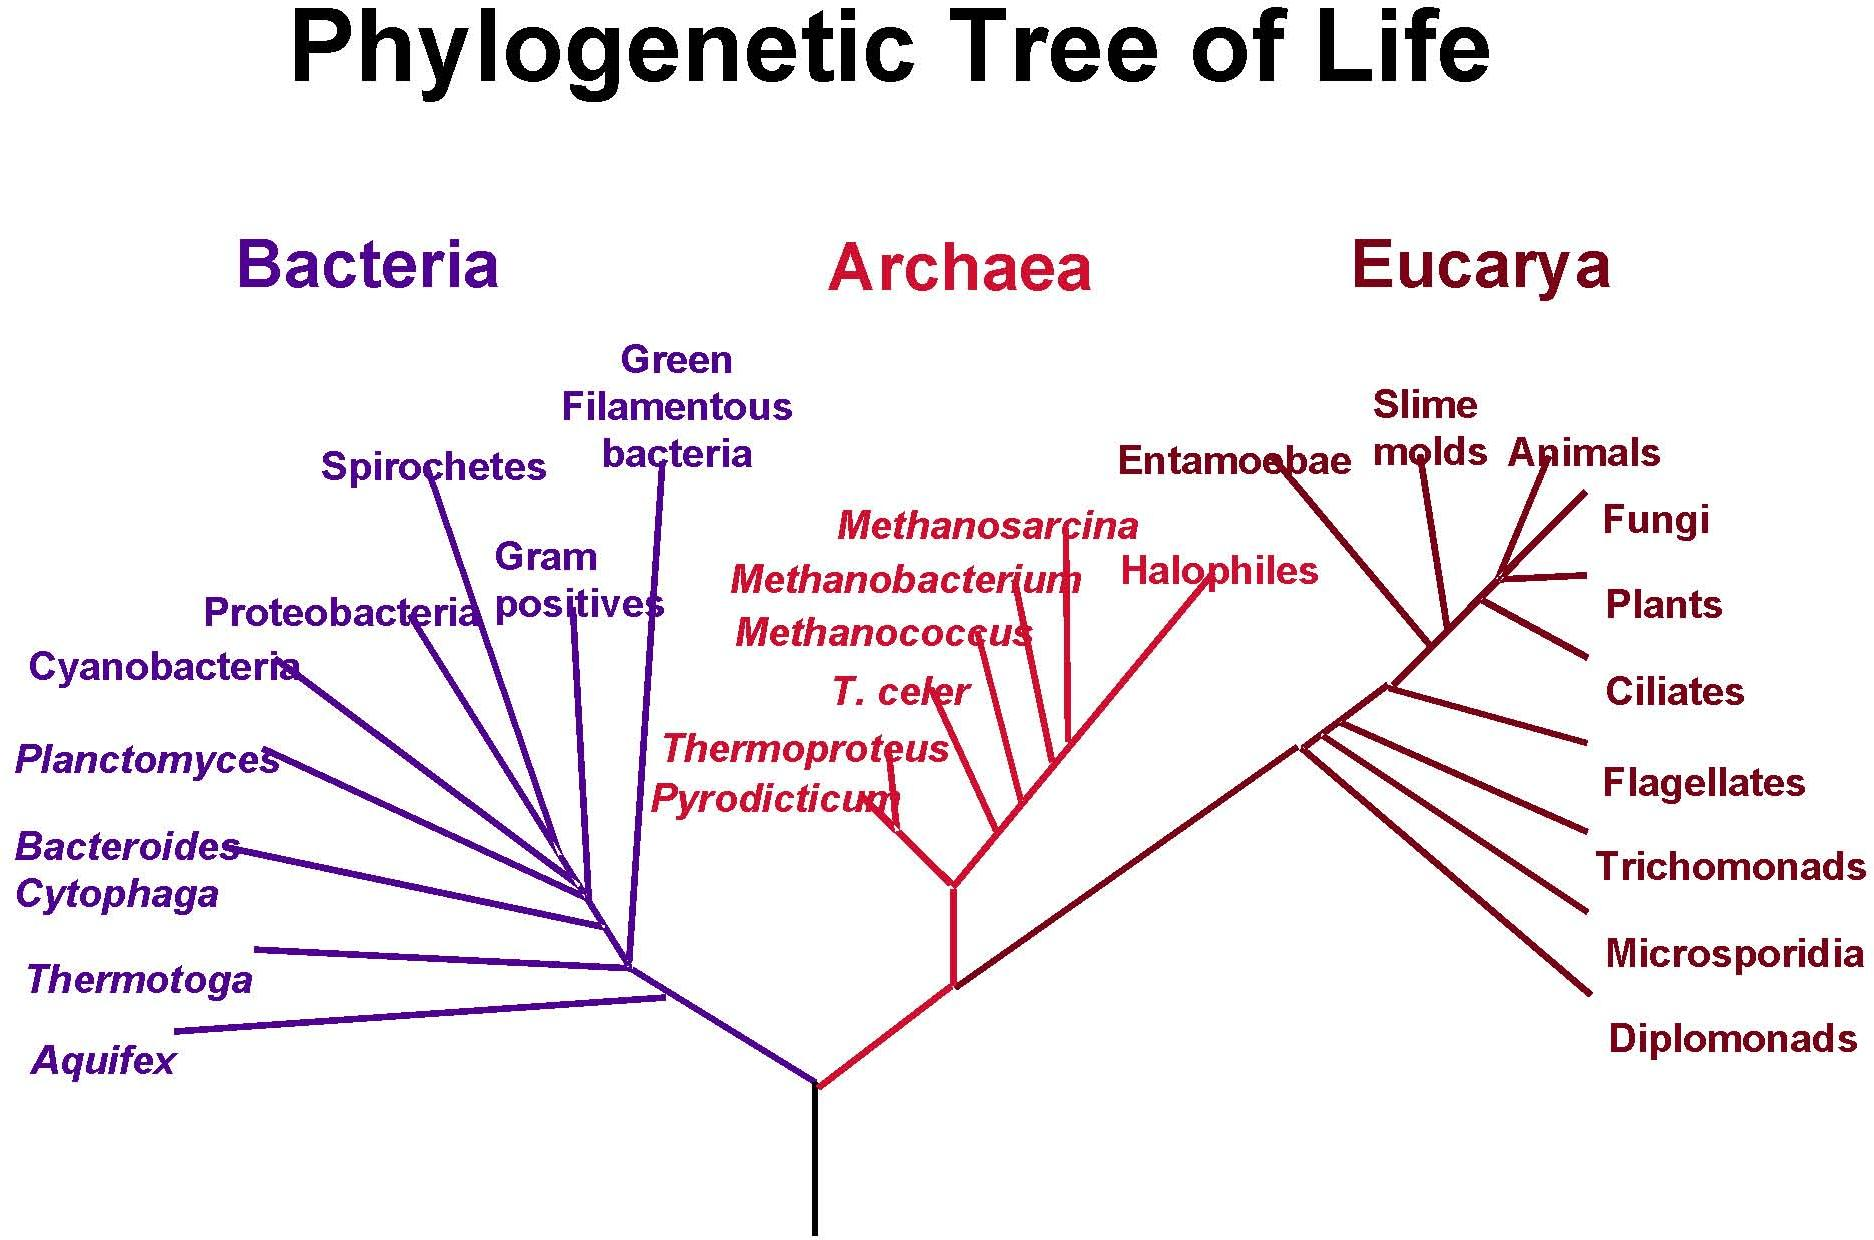 Universe Life Science Future 05 23 2011 Roper Dryer Parts Diagram 864 X 1095 16 Kb Png Excellent